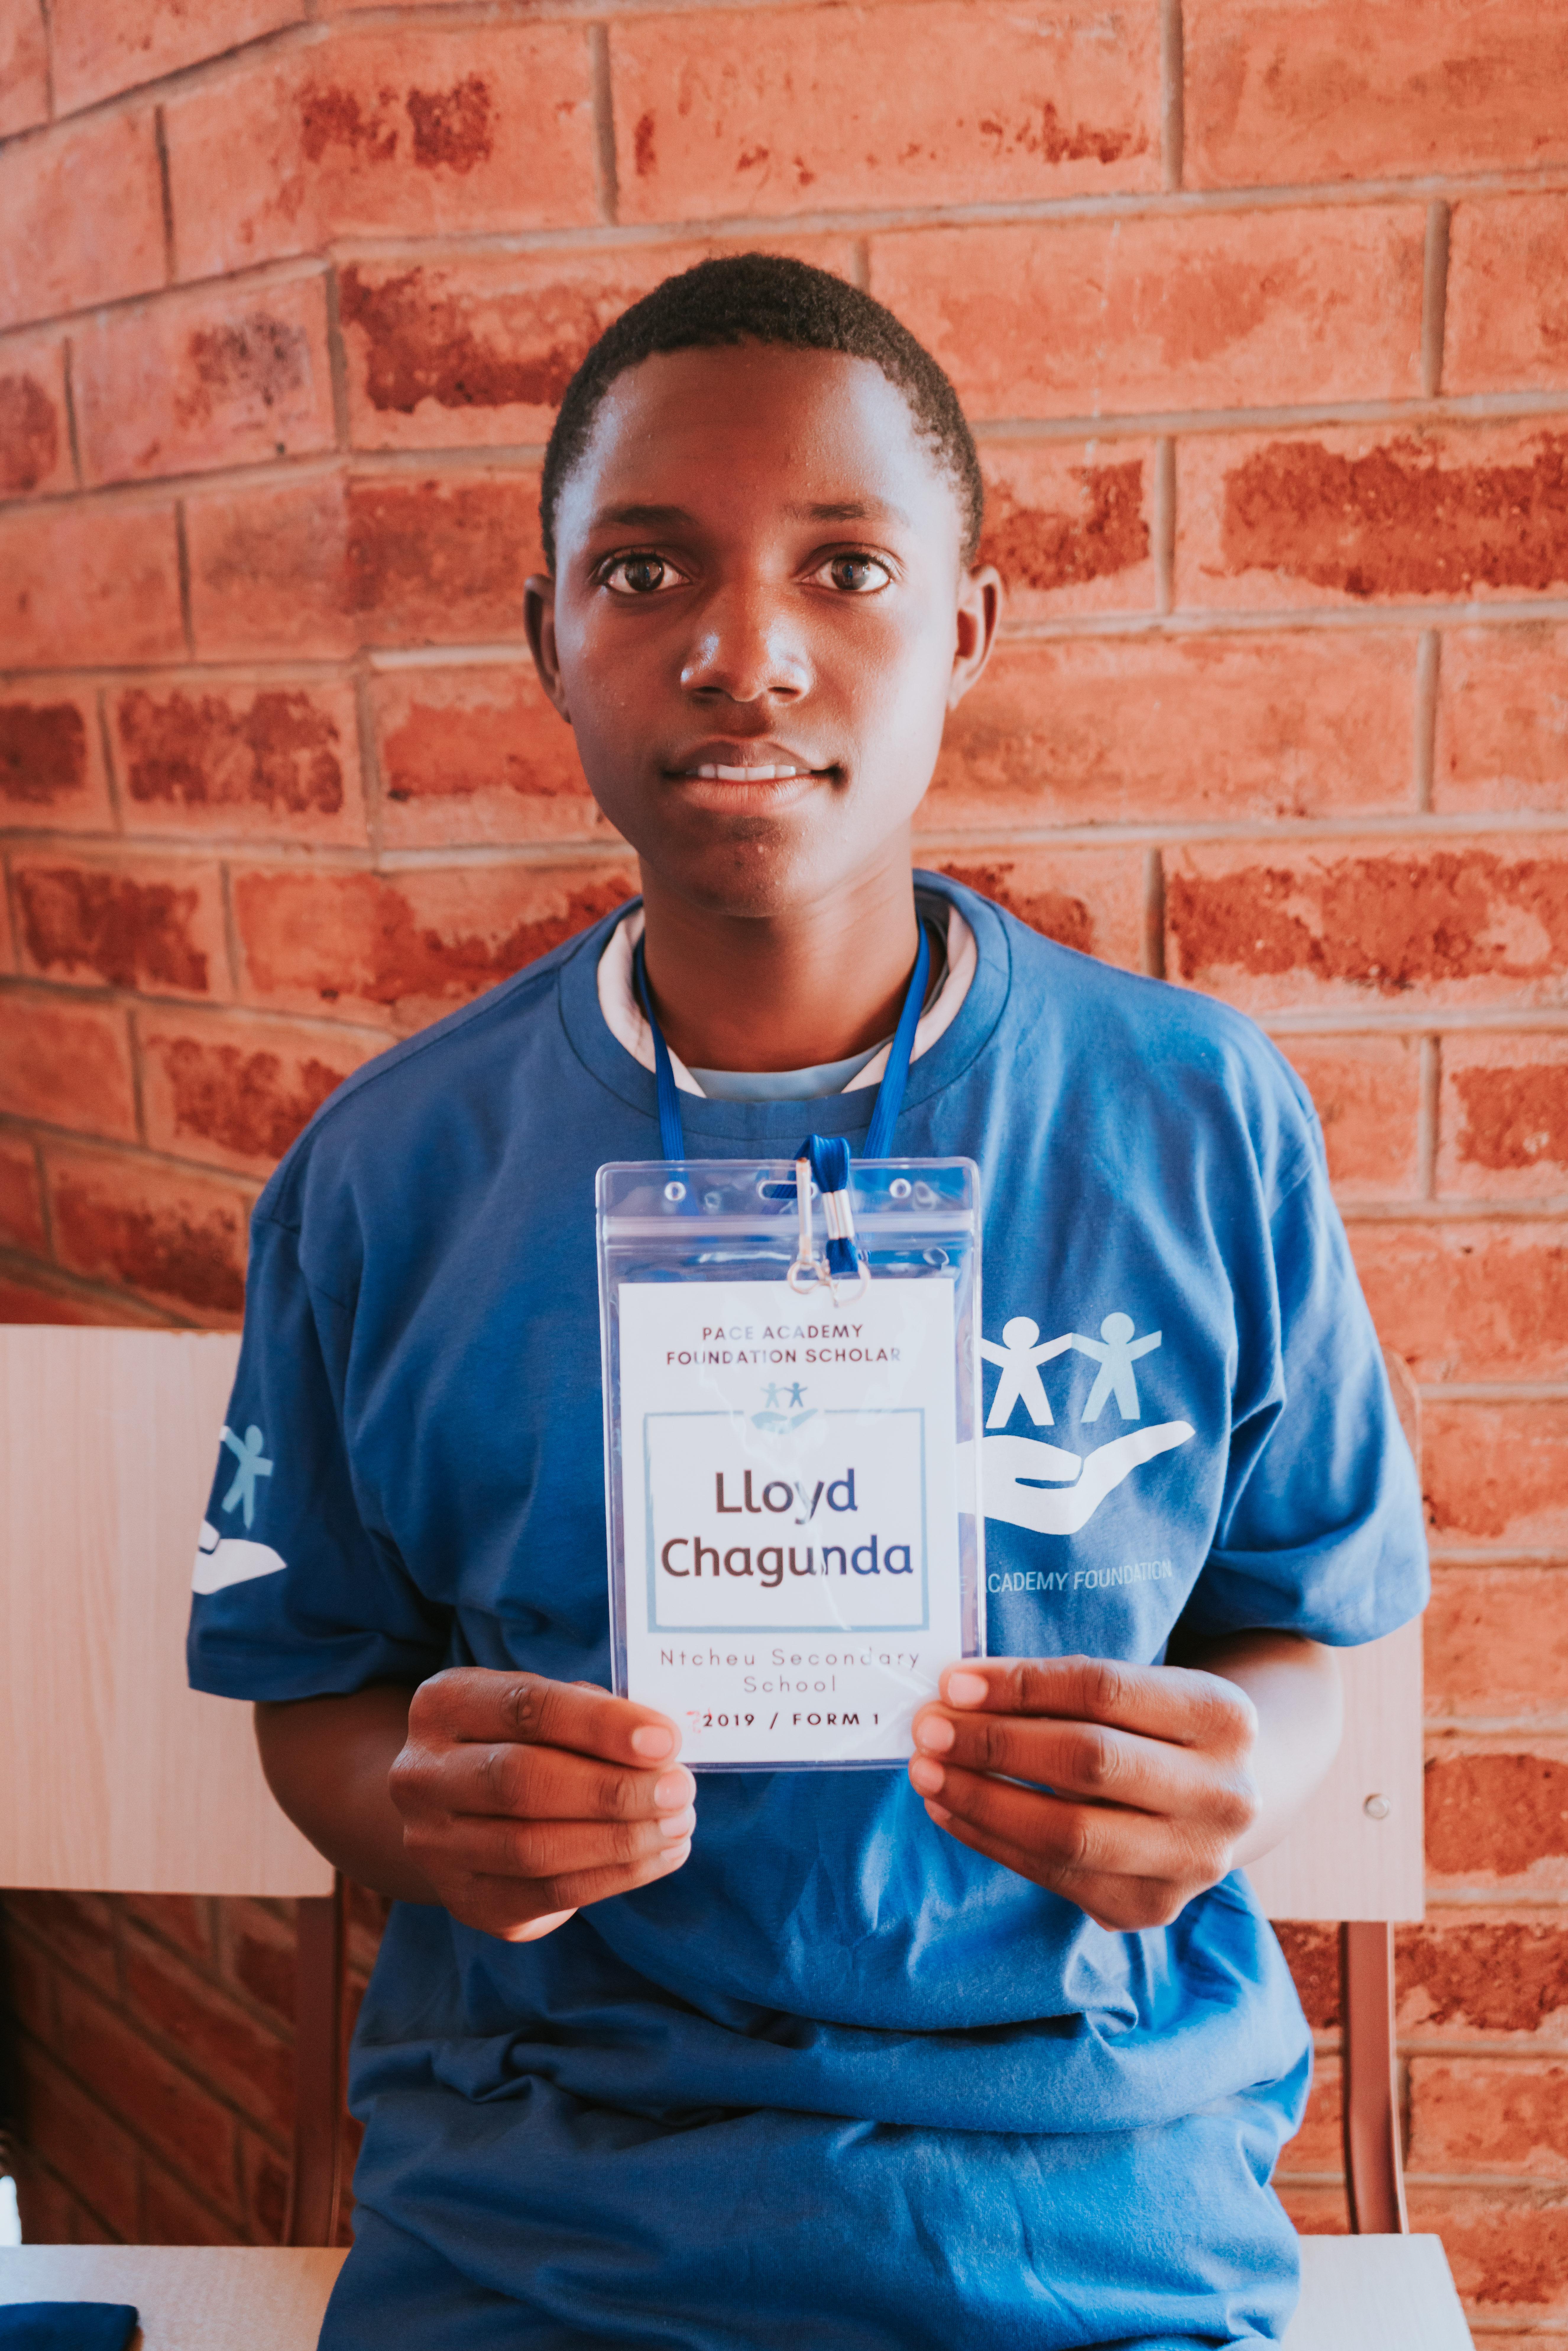 Lloyd Chagunda (Ntcheu Secondary School)